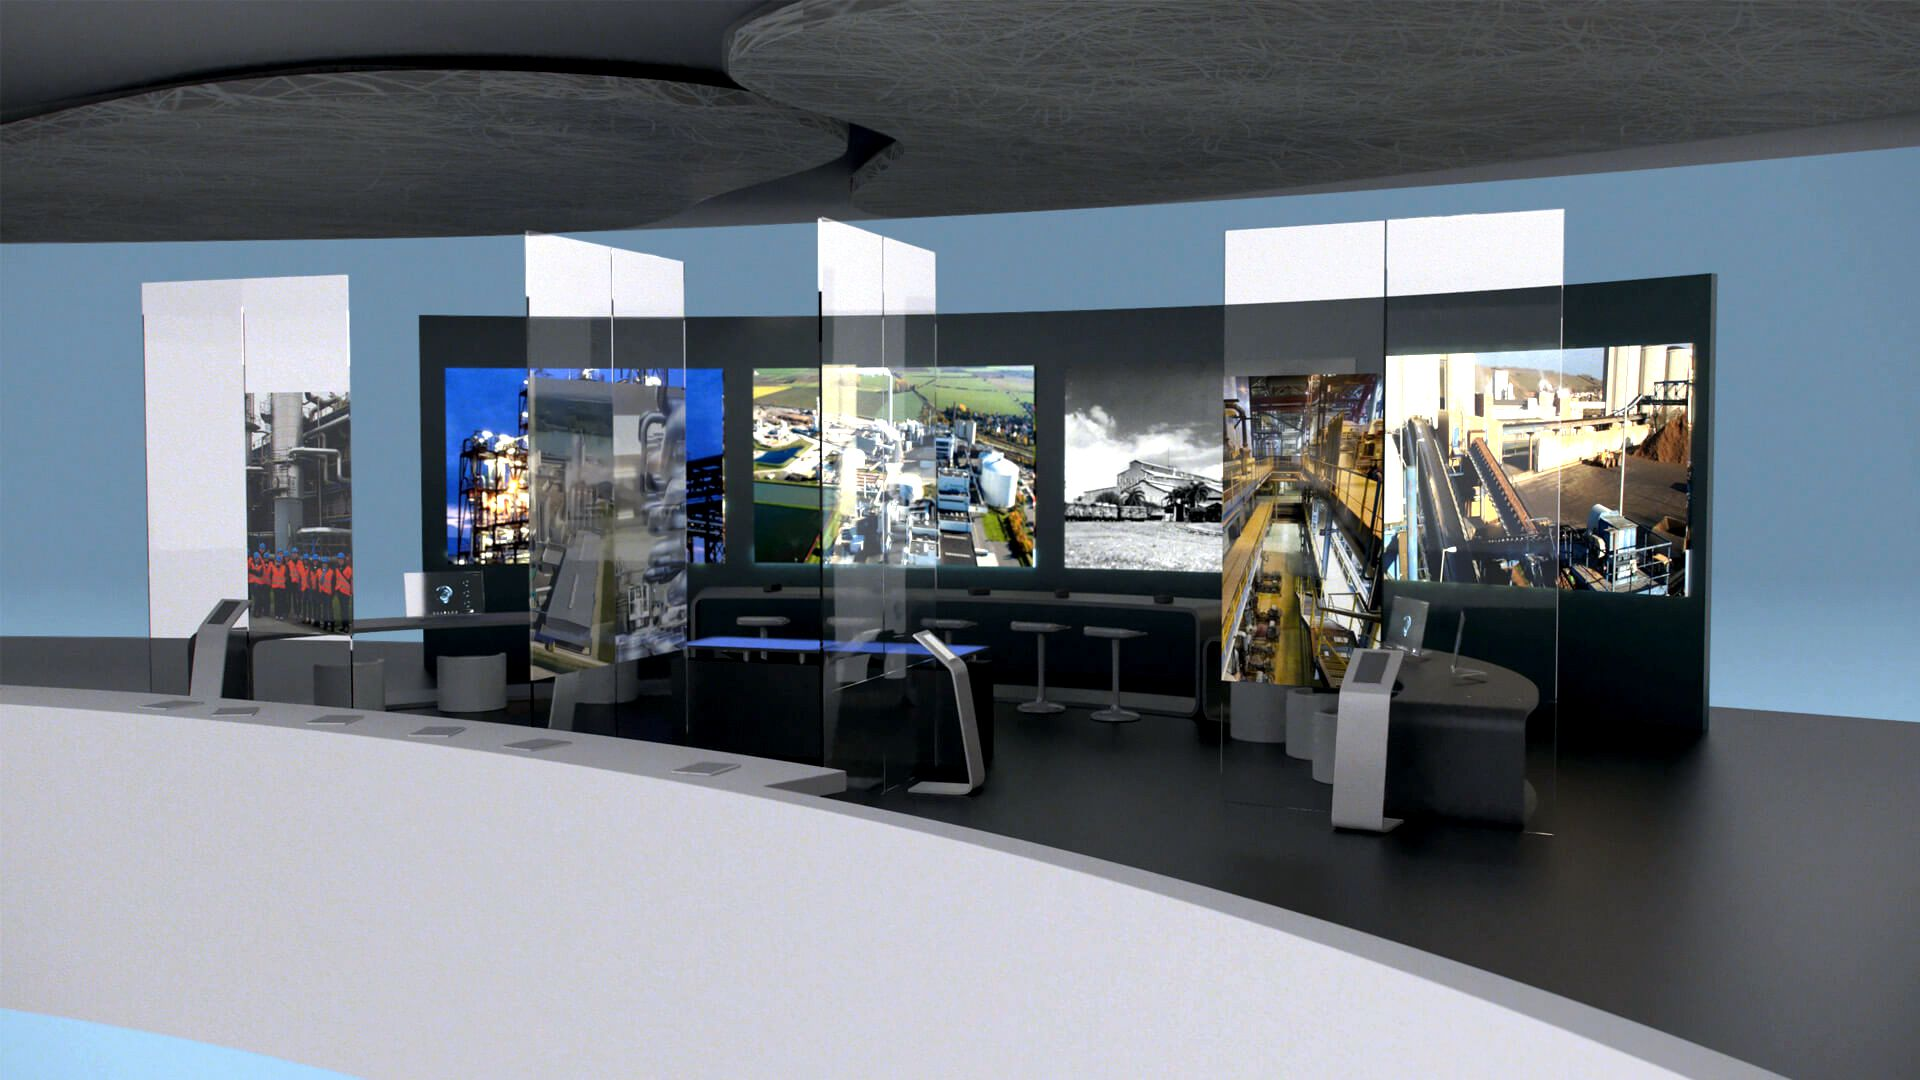 Exhibition-Concept-Foodworld-Bayern-Sued_04